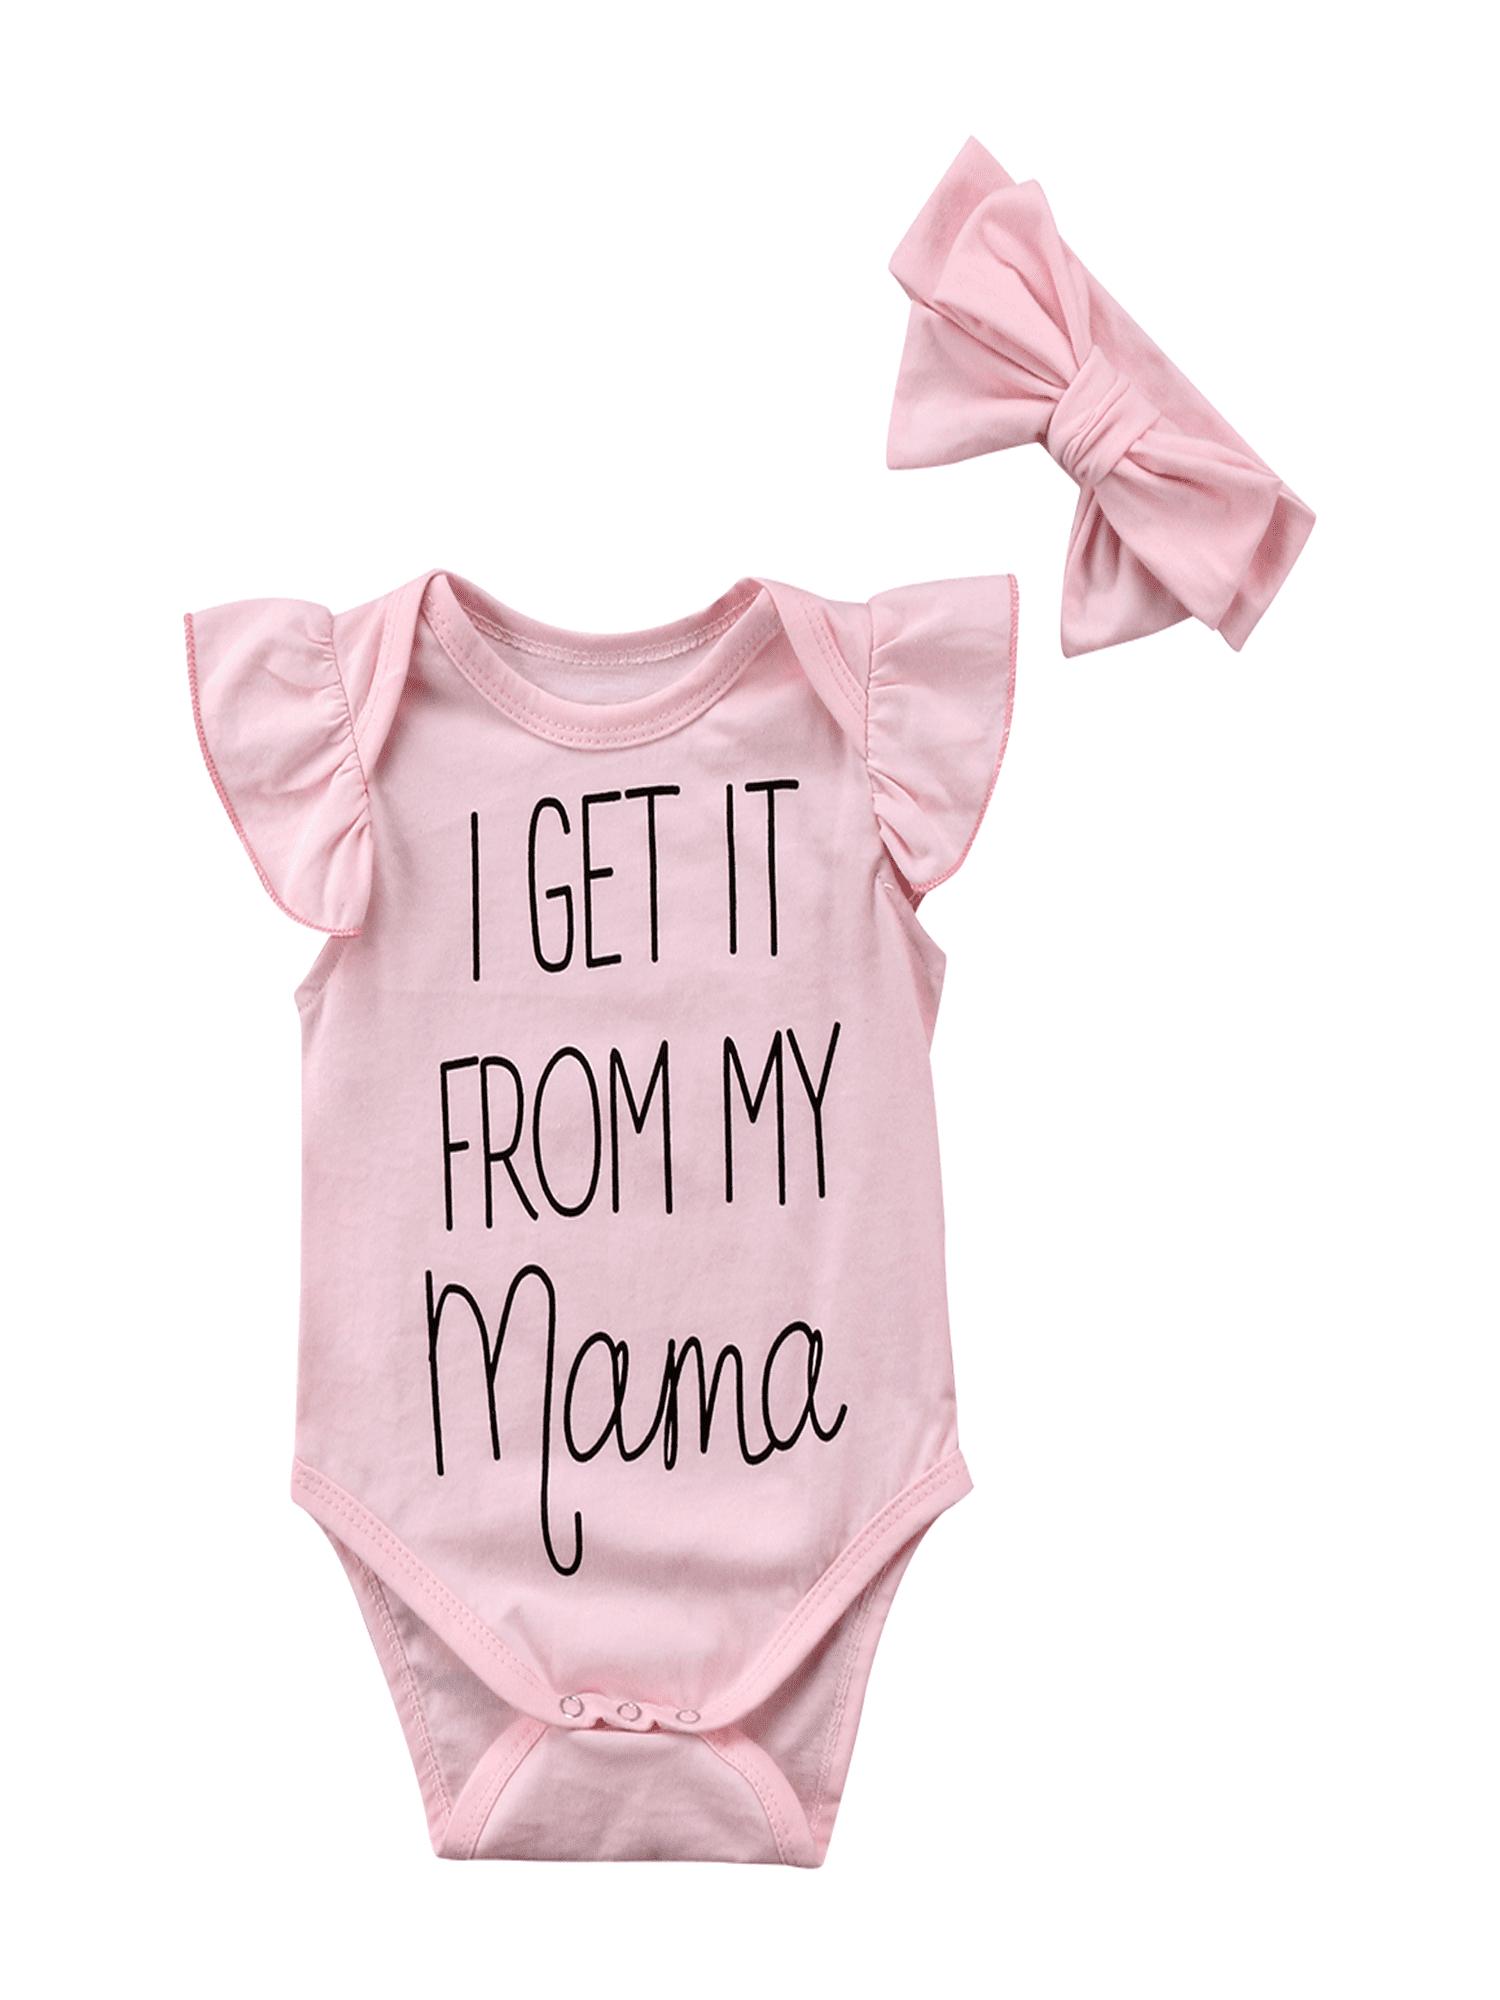 Headband Clothes Outfits Set Infant Baby Girls Floral Romper Bodysuit Jumpsuit